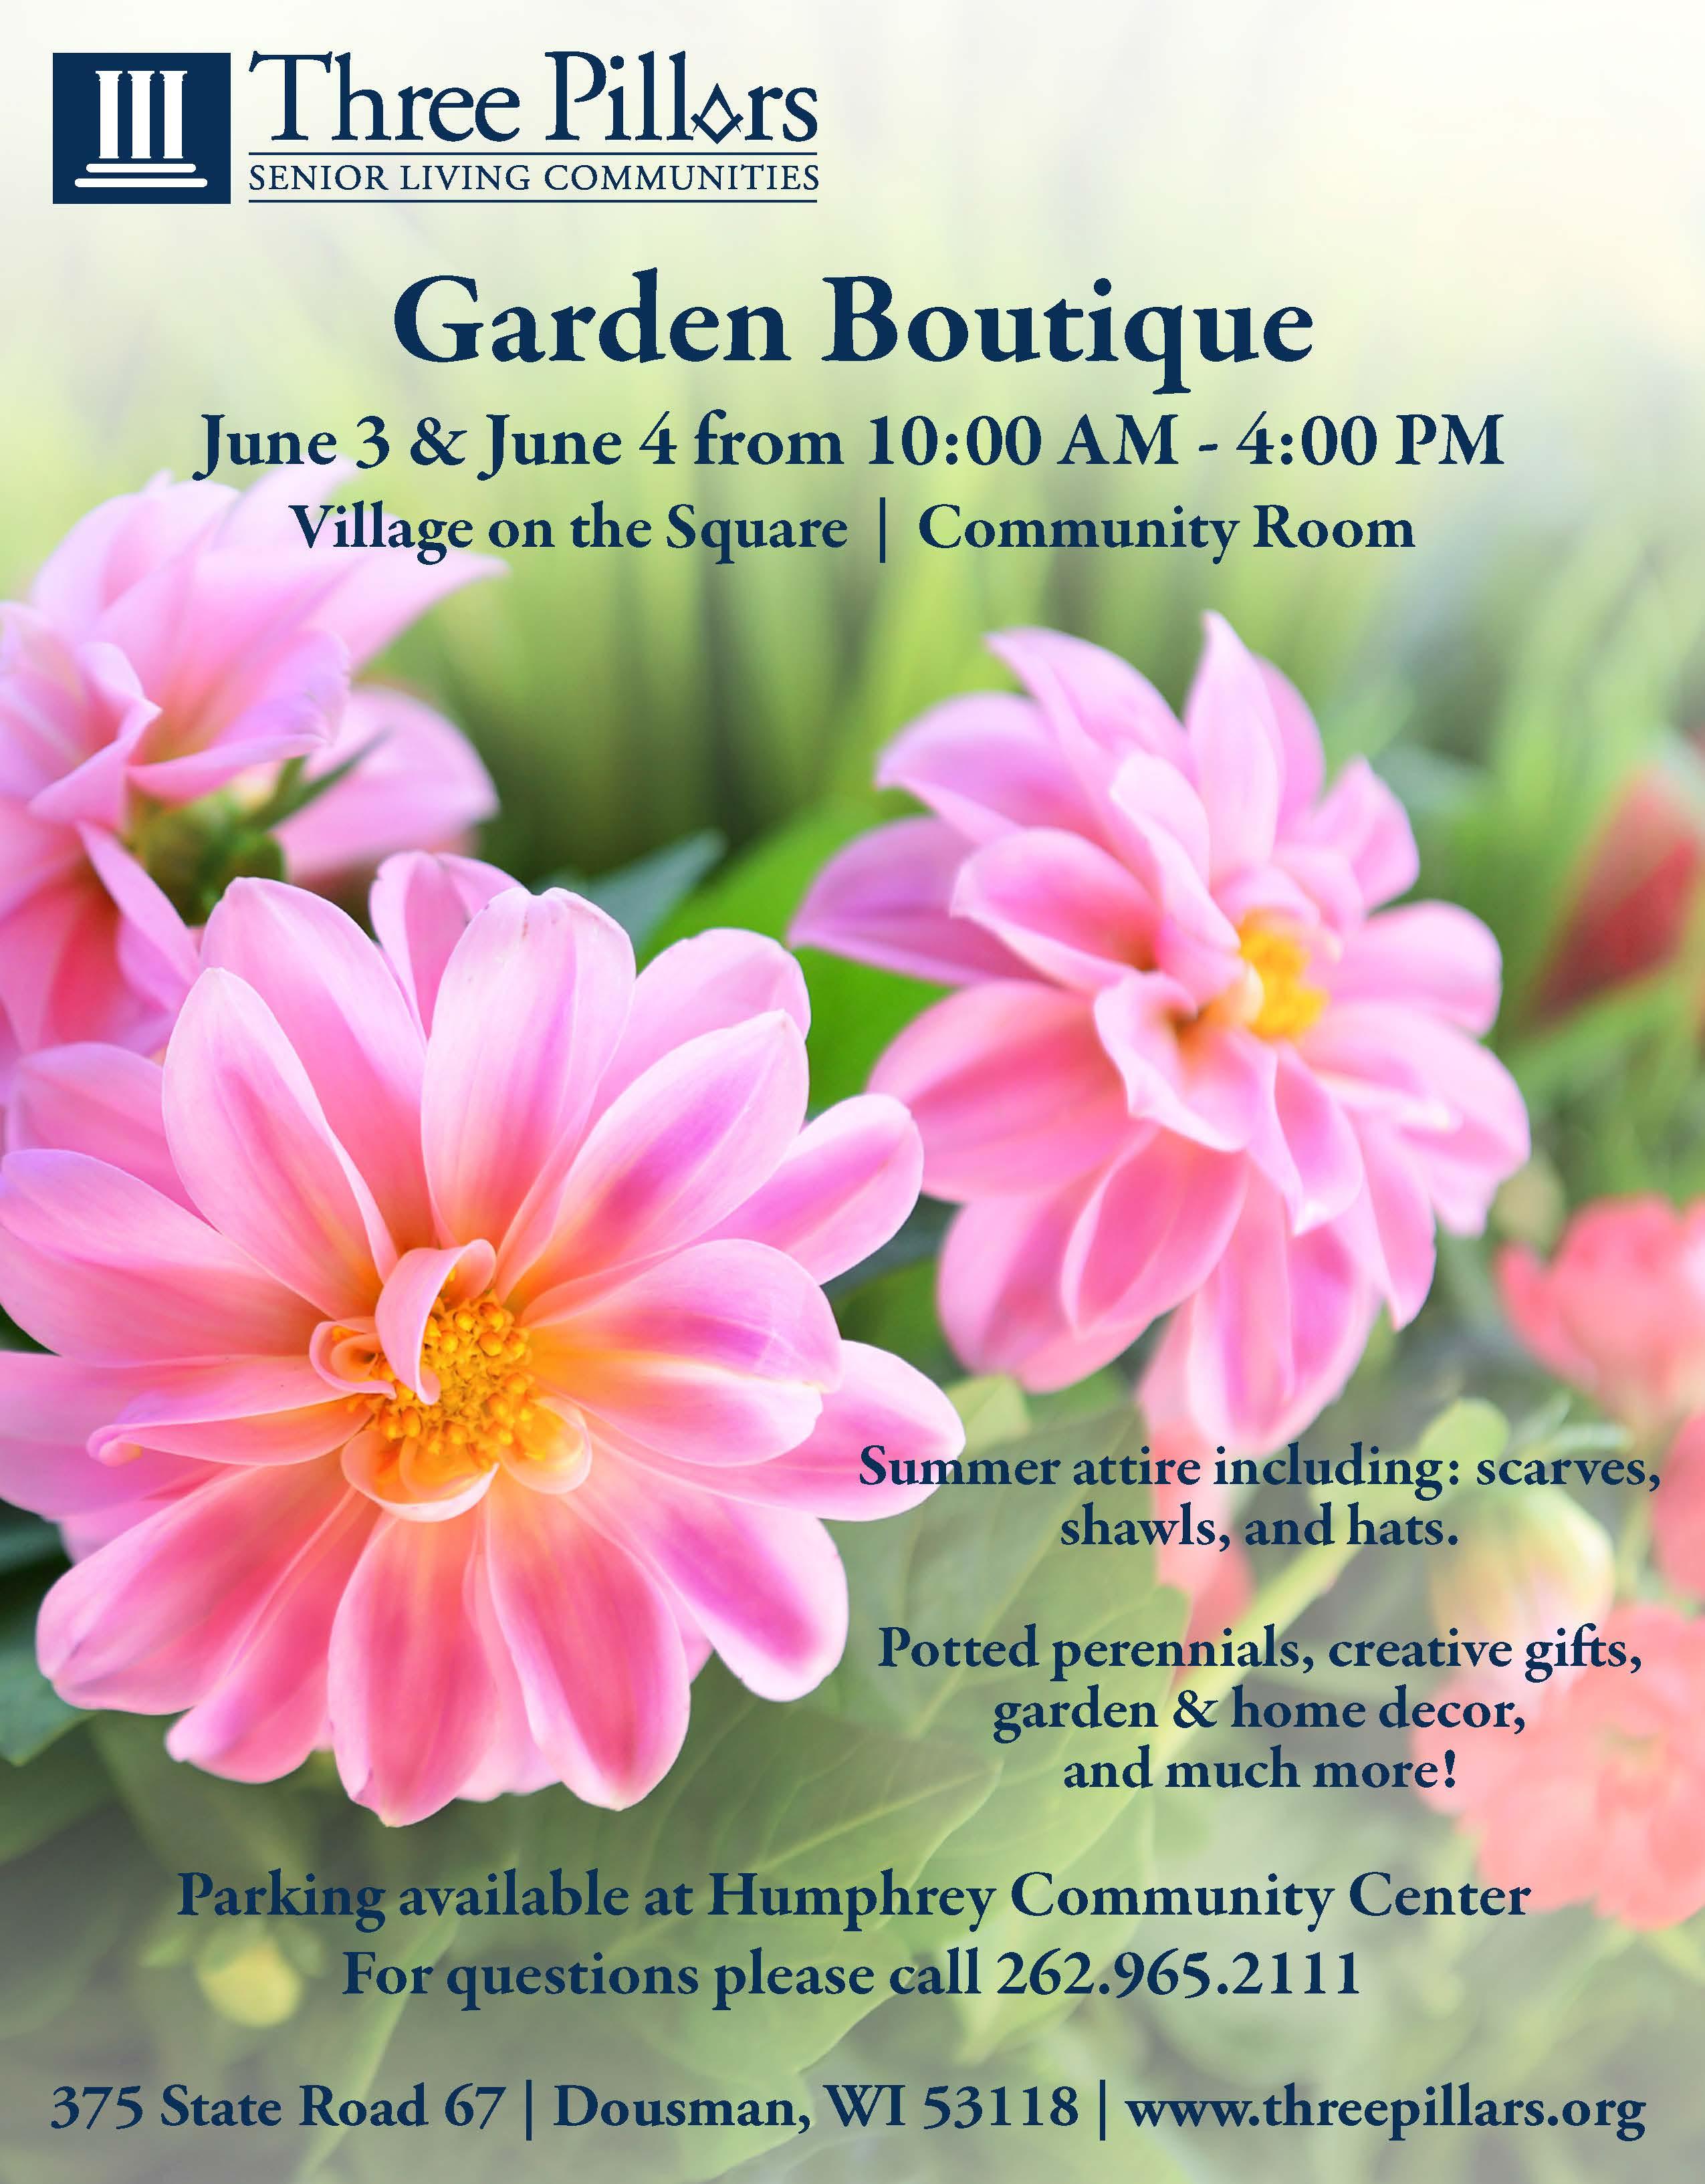 Three Pillars Garden Boutique - 2 Days! @ Three Pillars - Village on the Square | Dousman | Wisconsin | United States